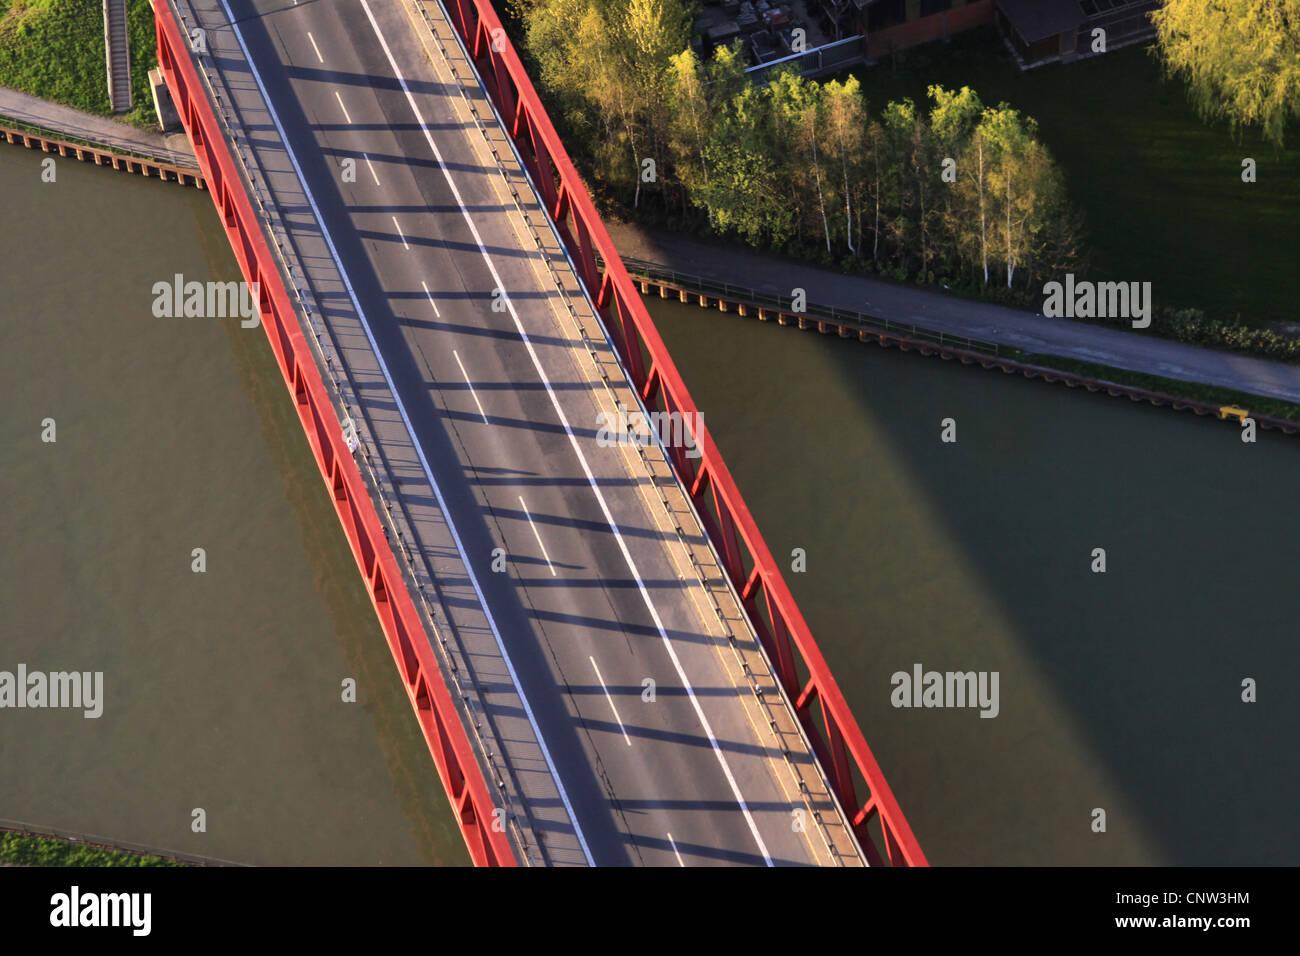 bridge of Muensterstrasse, Muenster street, over Dortmund Ems channel, Germany, North Rhine-Westphalia, Ruhr Area, - Stock Image